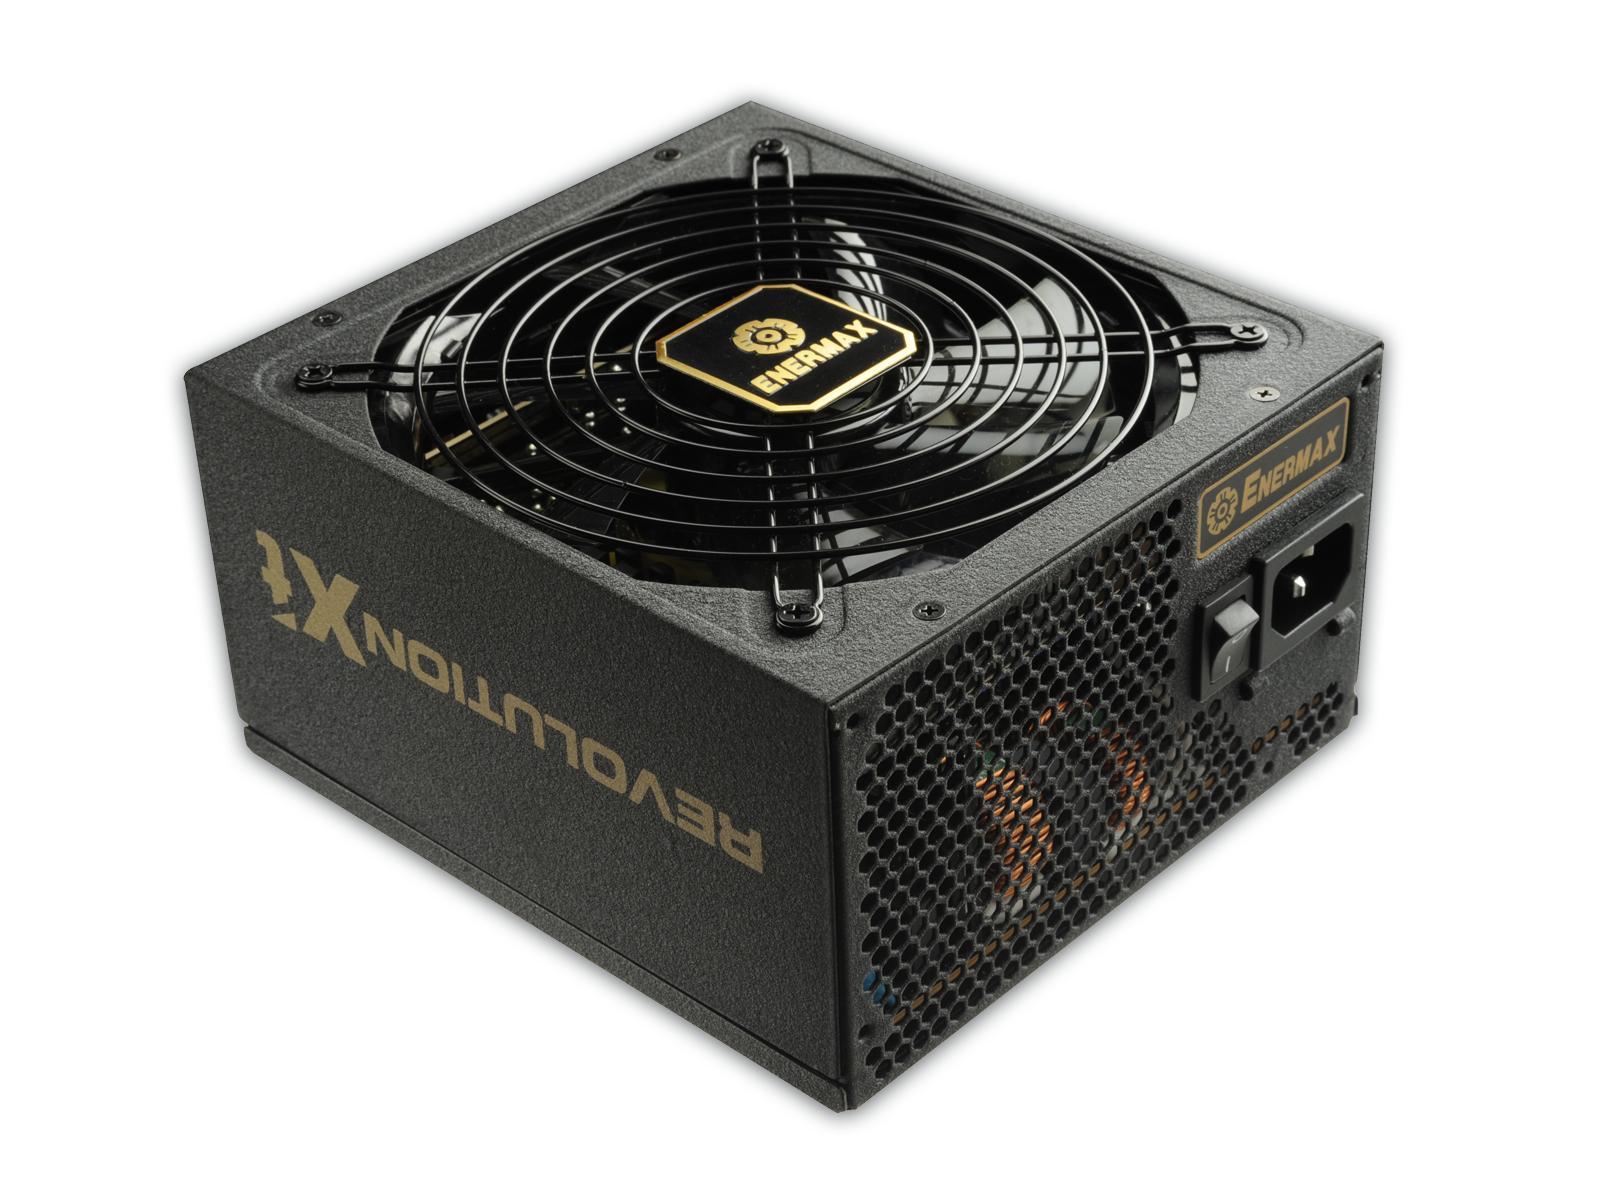 Enermax Revolution X't II power supply unit 550 W ATX Black